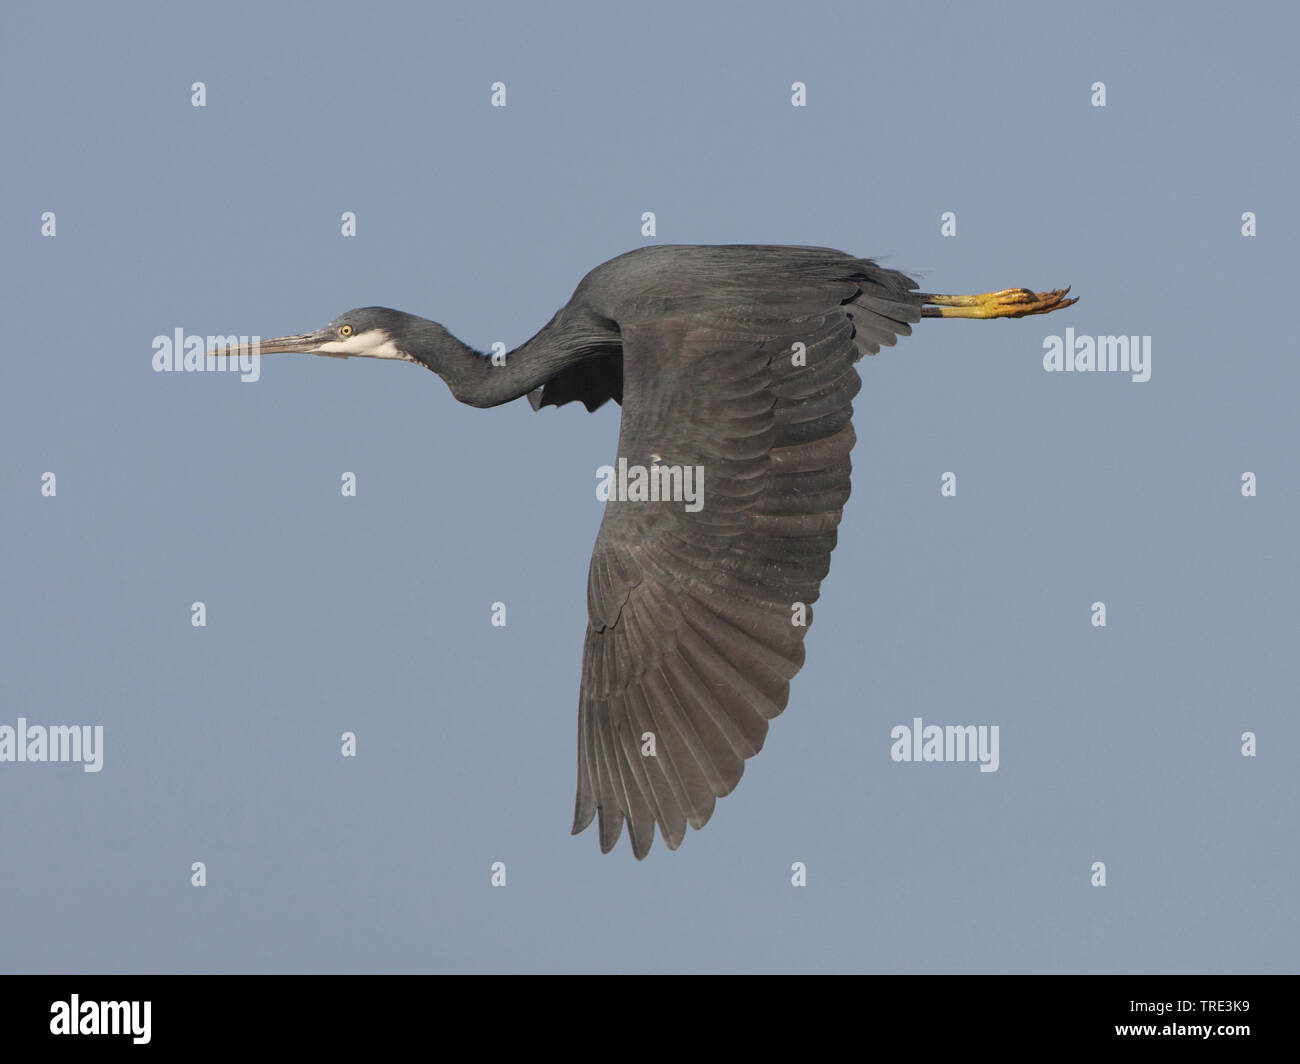 Kuestenreiher, Kuesten-Reiher (Egretta gularis), im Flug, dunkle Morphe, Gambia | western reef egret (Egretta gularis), in flight, dark morph, Gambia - Stock Image